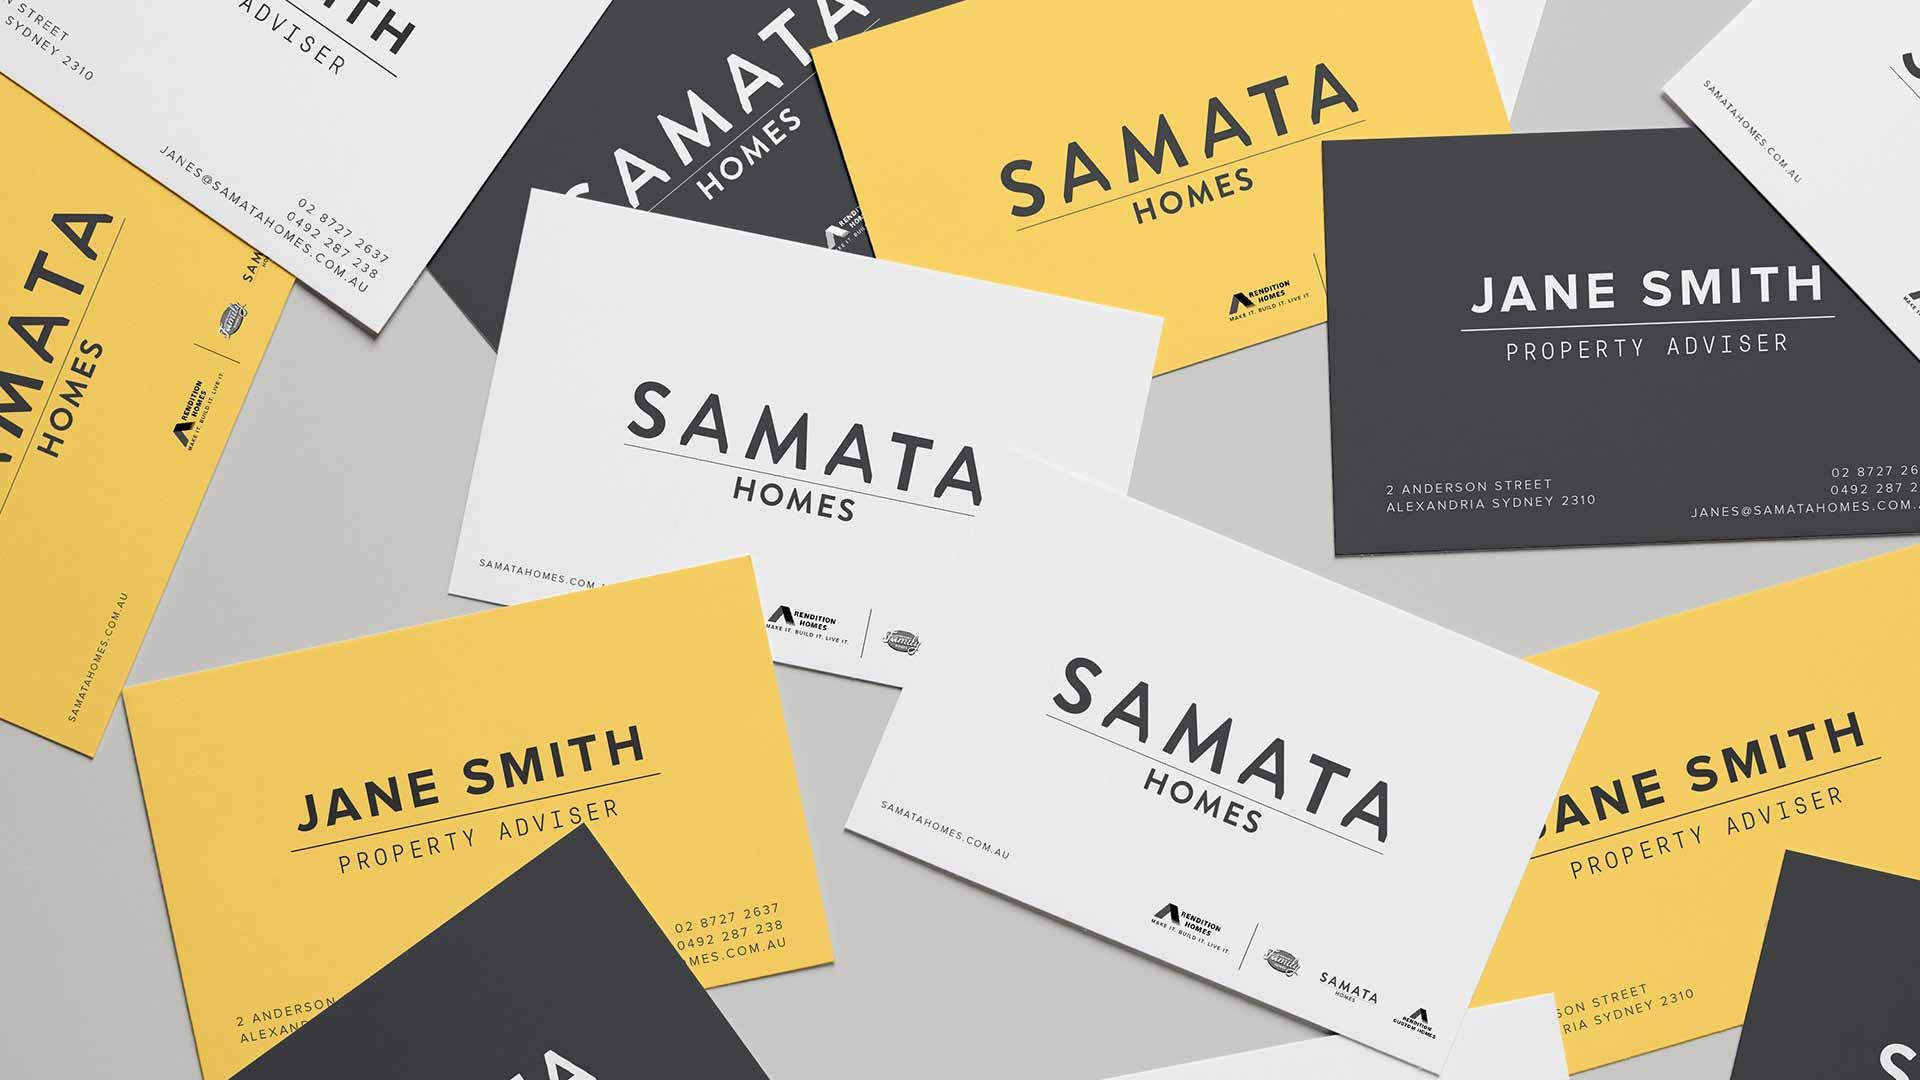 SAMATA_1920x1080px_Website_Folio_03